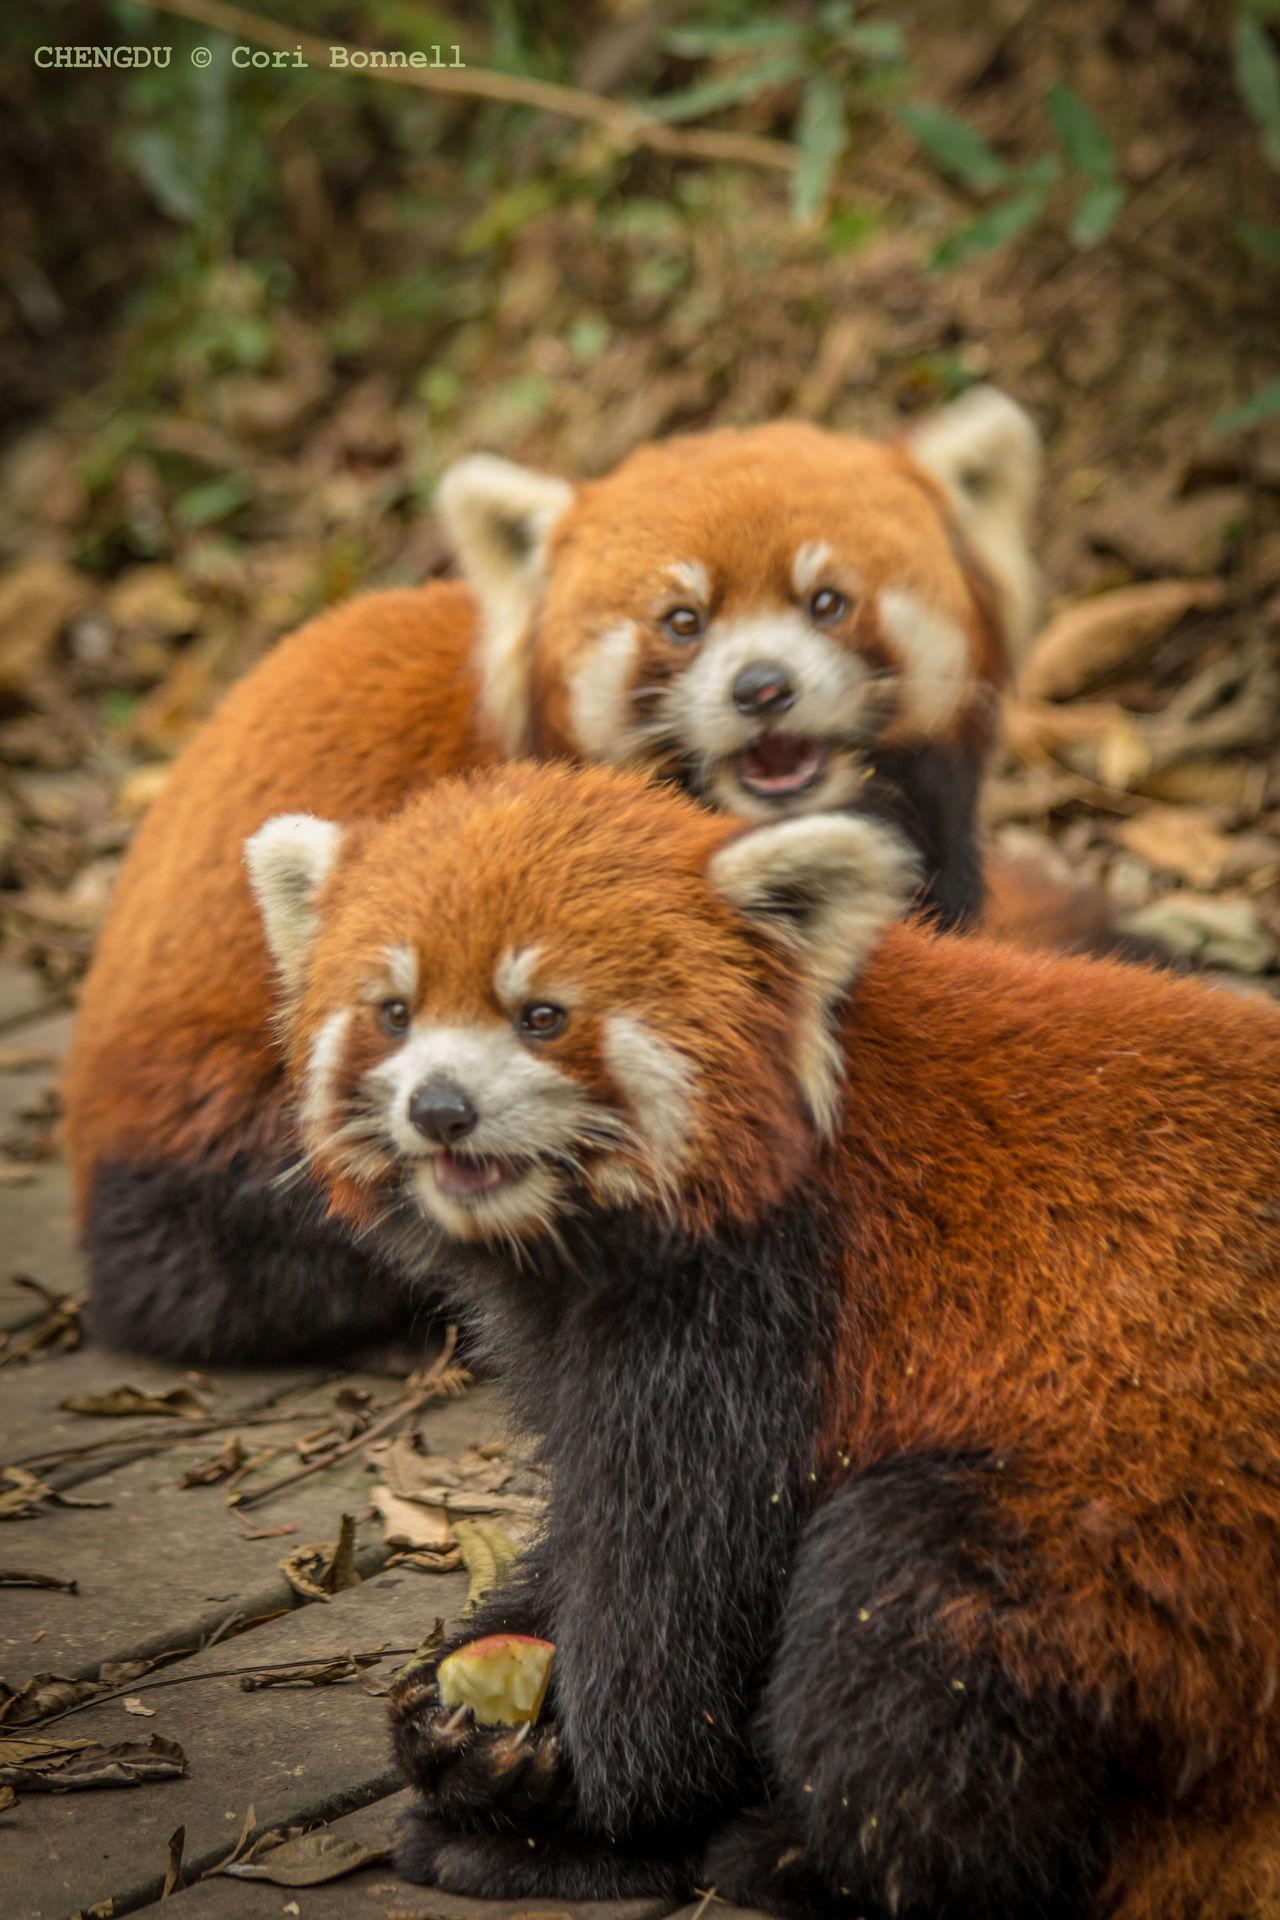 Panda life Animal Themes Chengdu Chengdu Research Base Of Giant Panda China Wildlife Day Focus On Foreground Nature No People Outdoors Panda Red Panda Sichuan Province